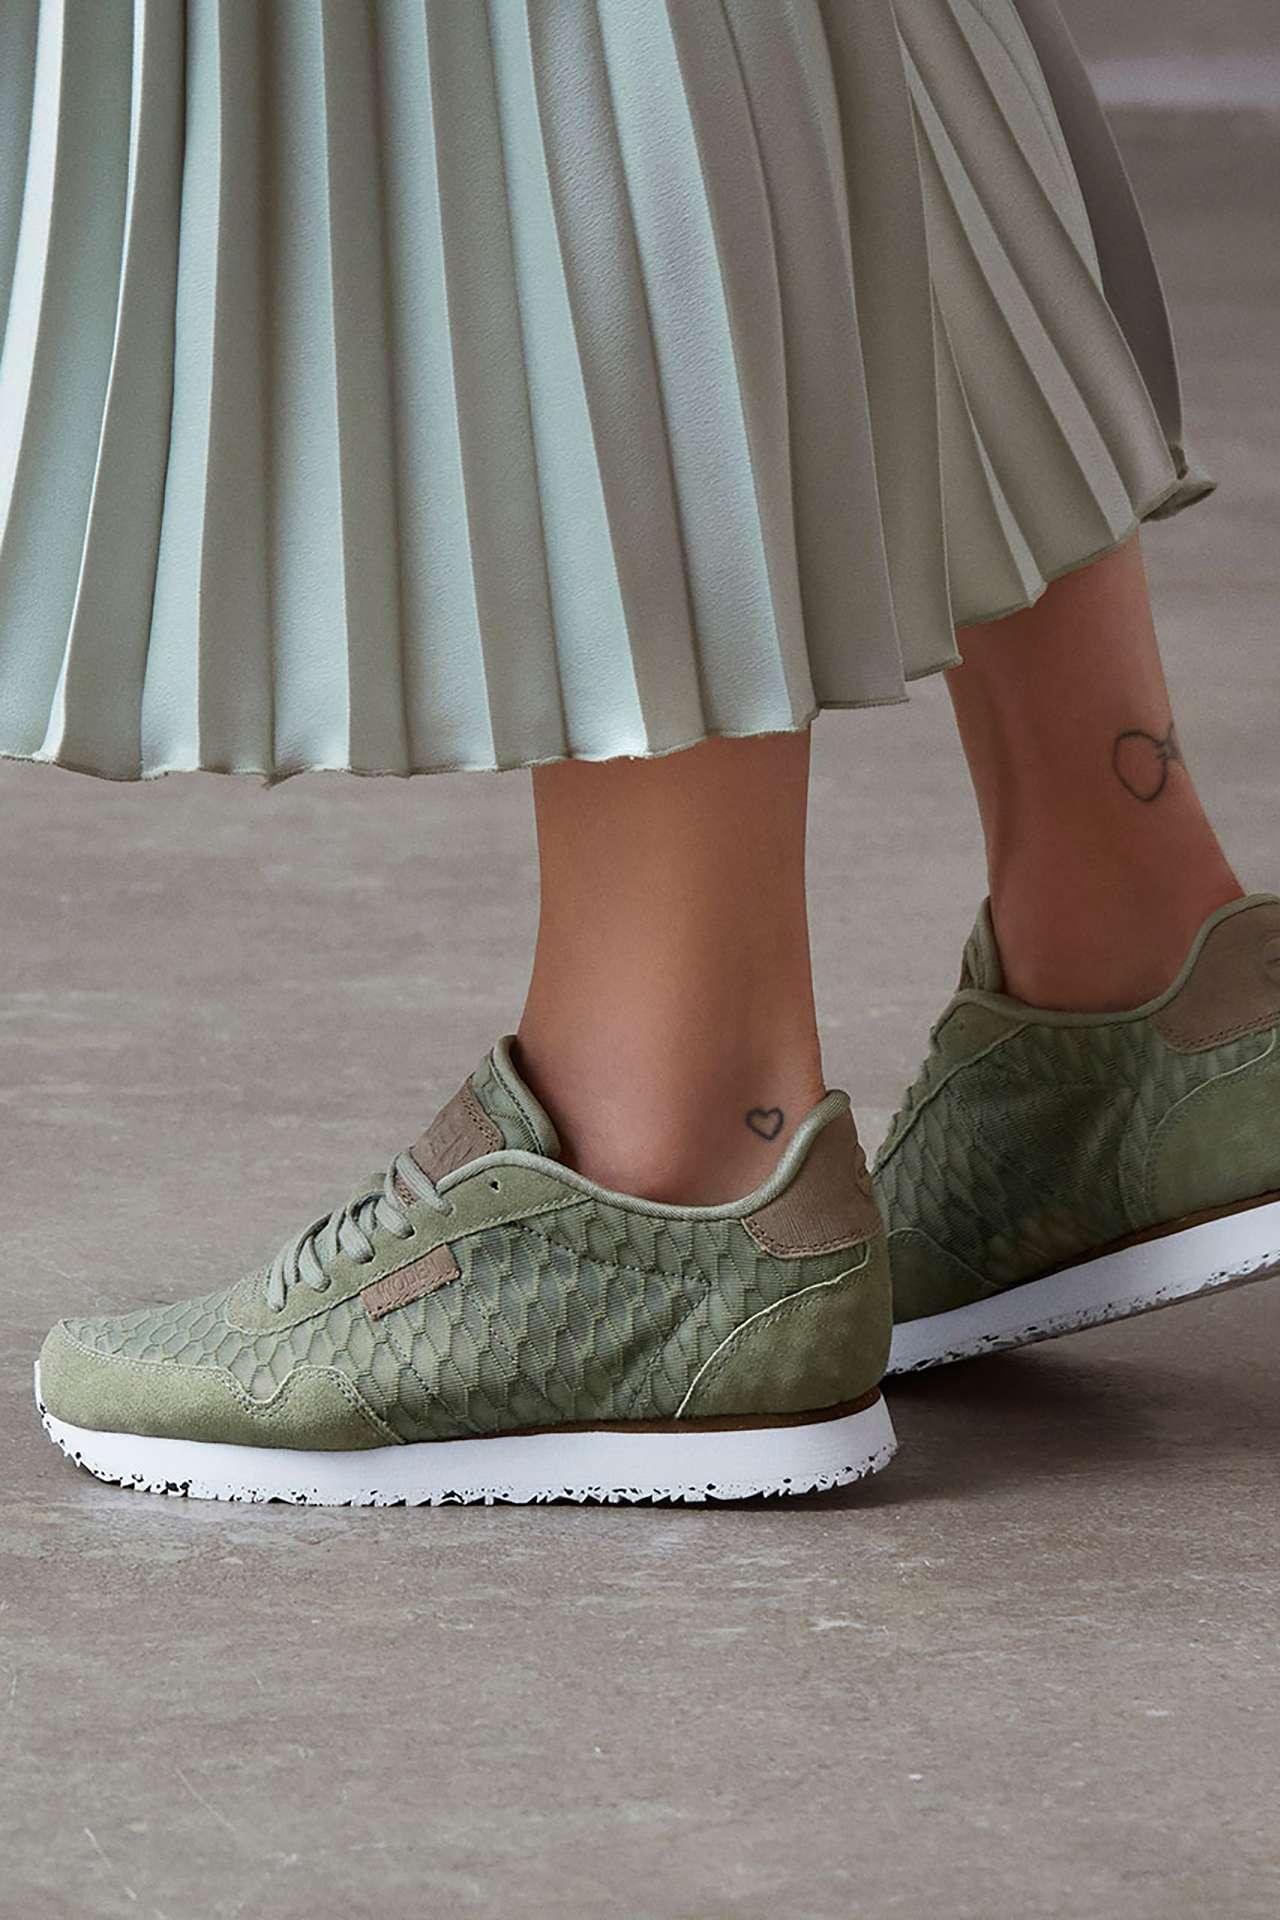 WODEN-Scandinavian-sneaker-kurk-minimalistisch-design_1280x1920